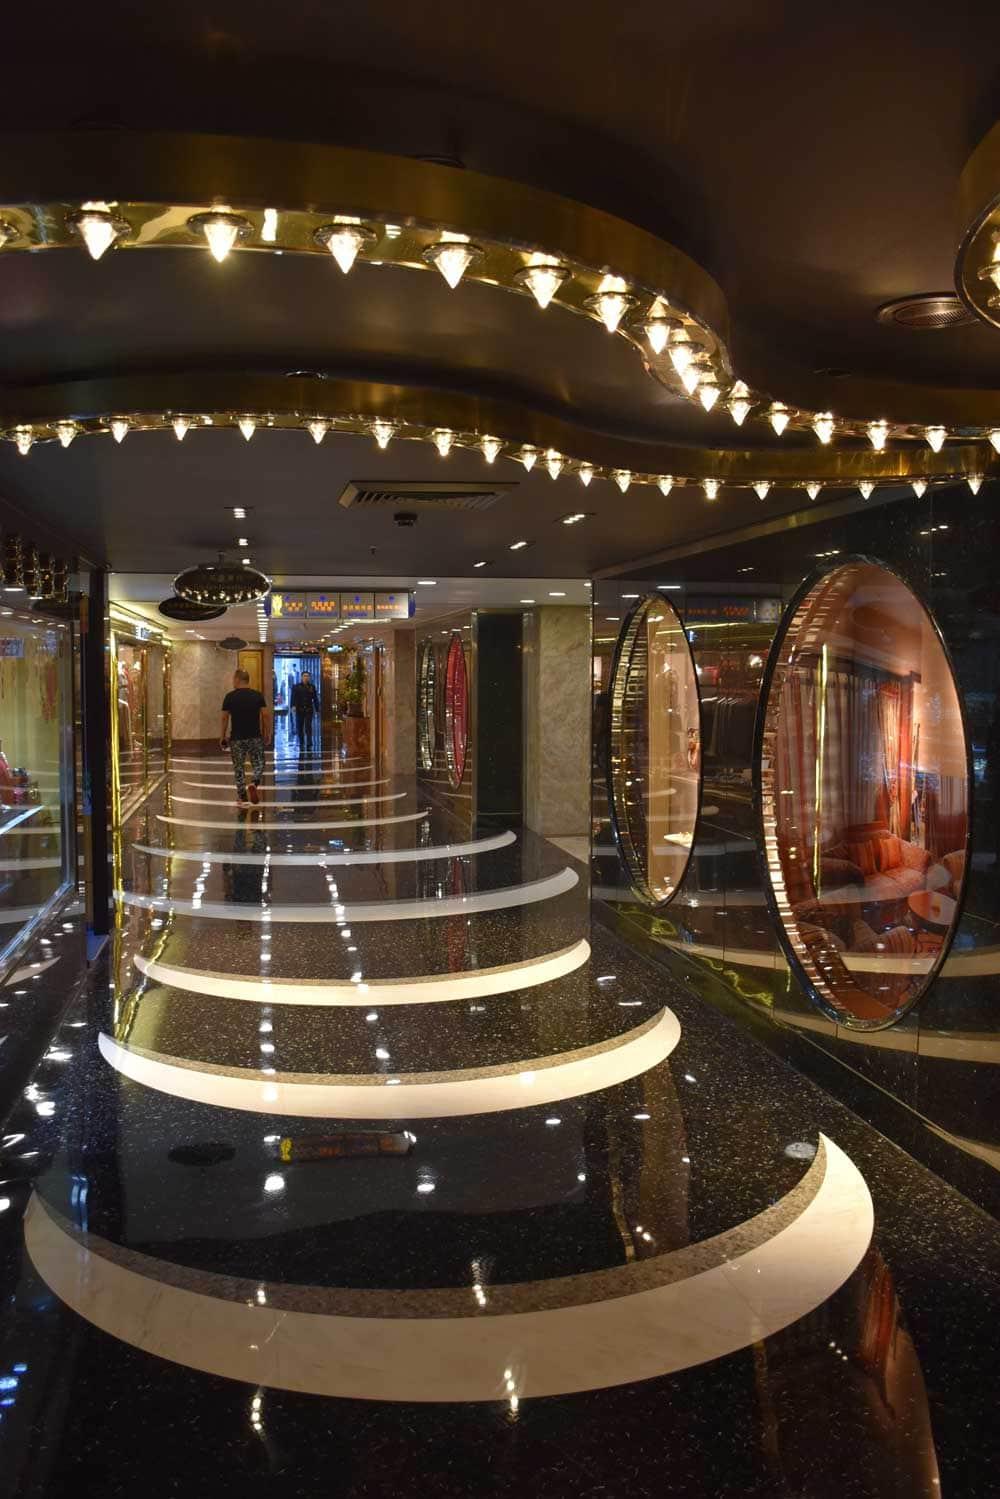 Hotel Lisboa shopping arcade